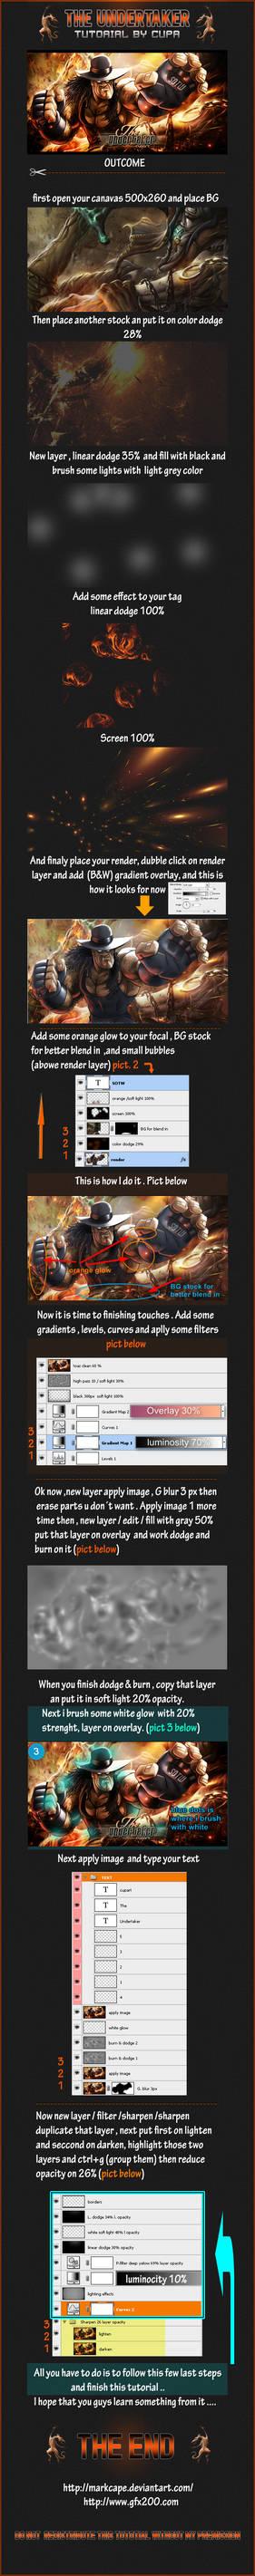 The undertaker tutorial by Cupa